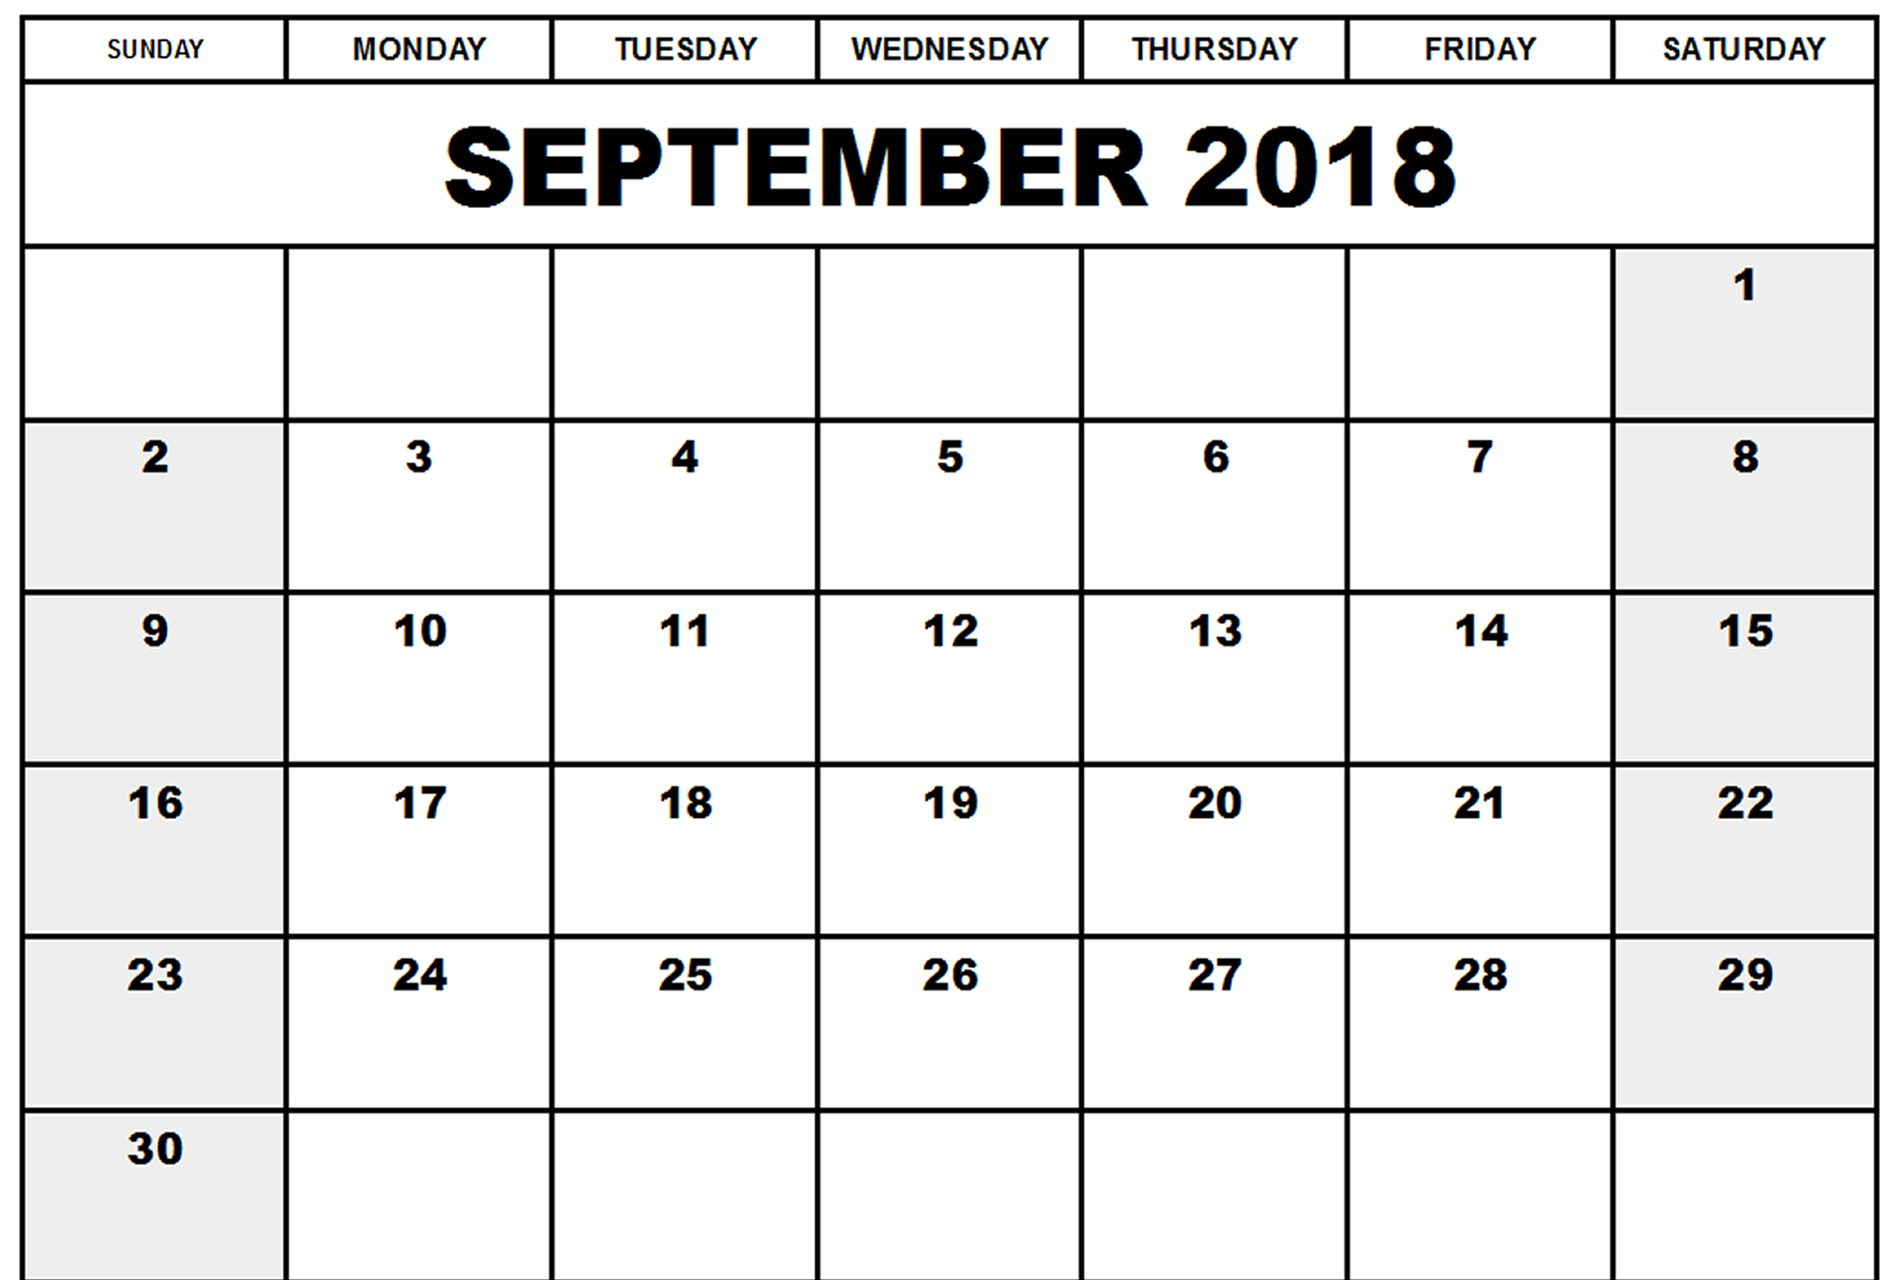 Free September 2018 Calendar Printable Template With Holidays with regard to September Calendar Printable Template Blank